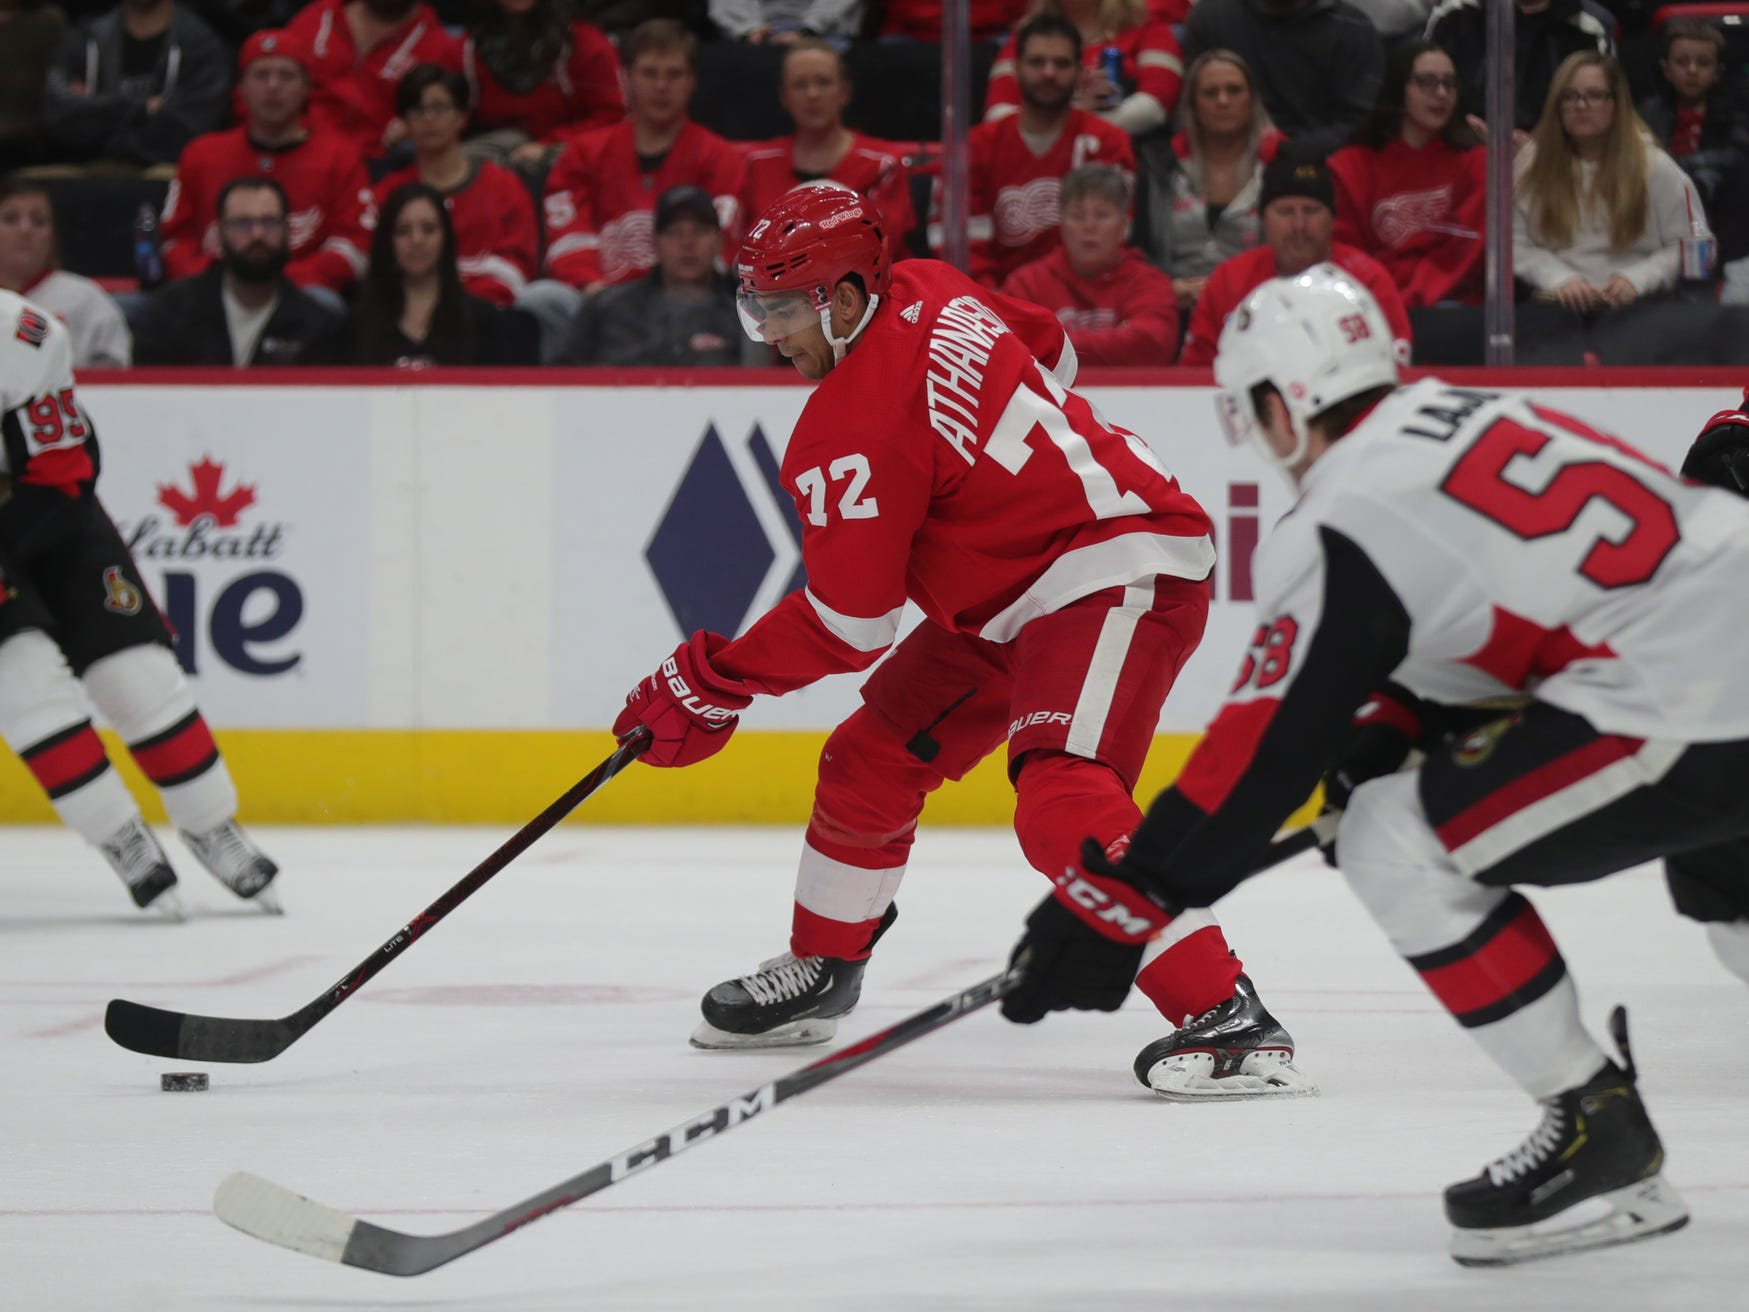 Andreas Athanasiou (72) skates against the Ottawa Senators on Feb. 14, 2019, at Little Caesars Arena in Detroit.